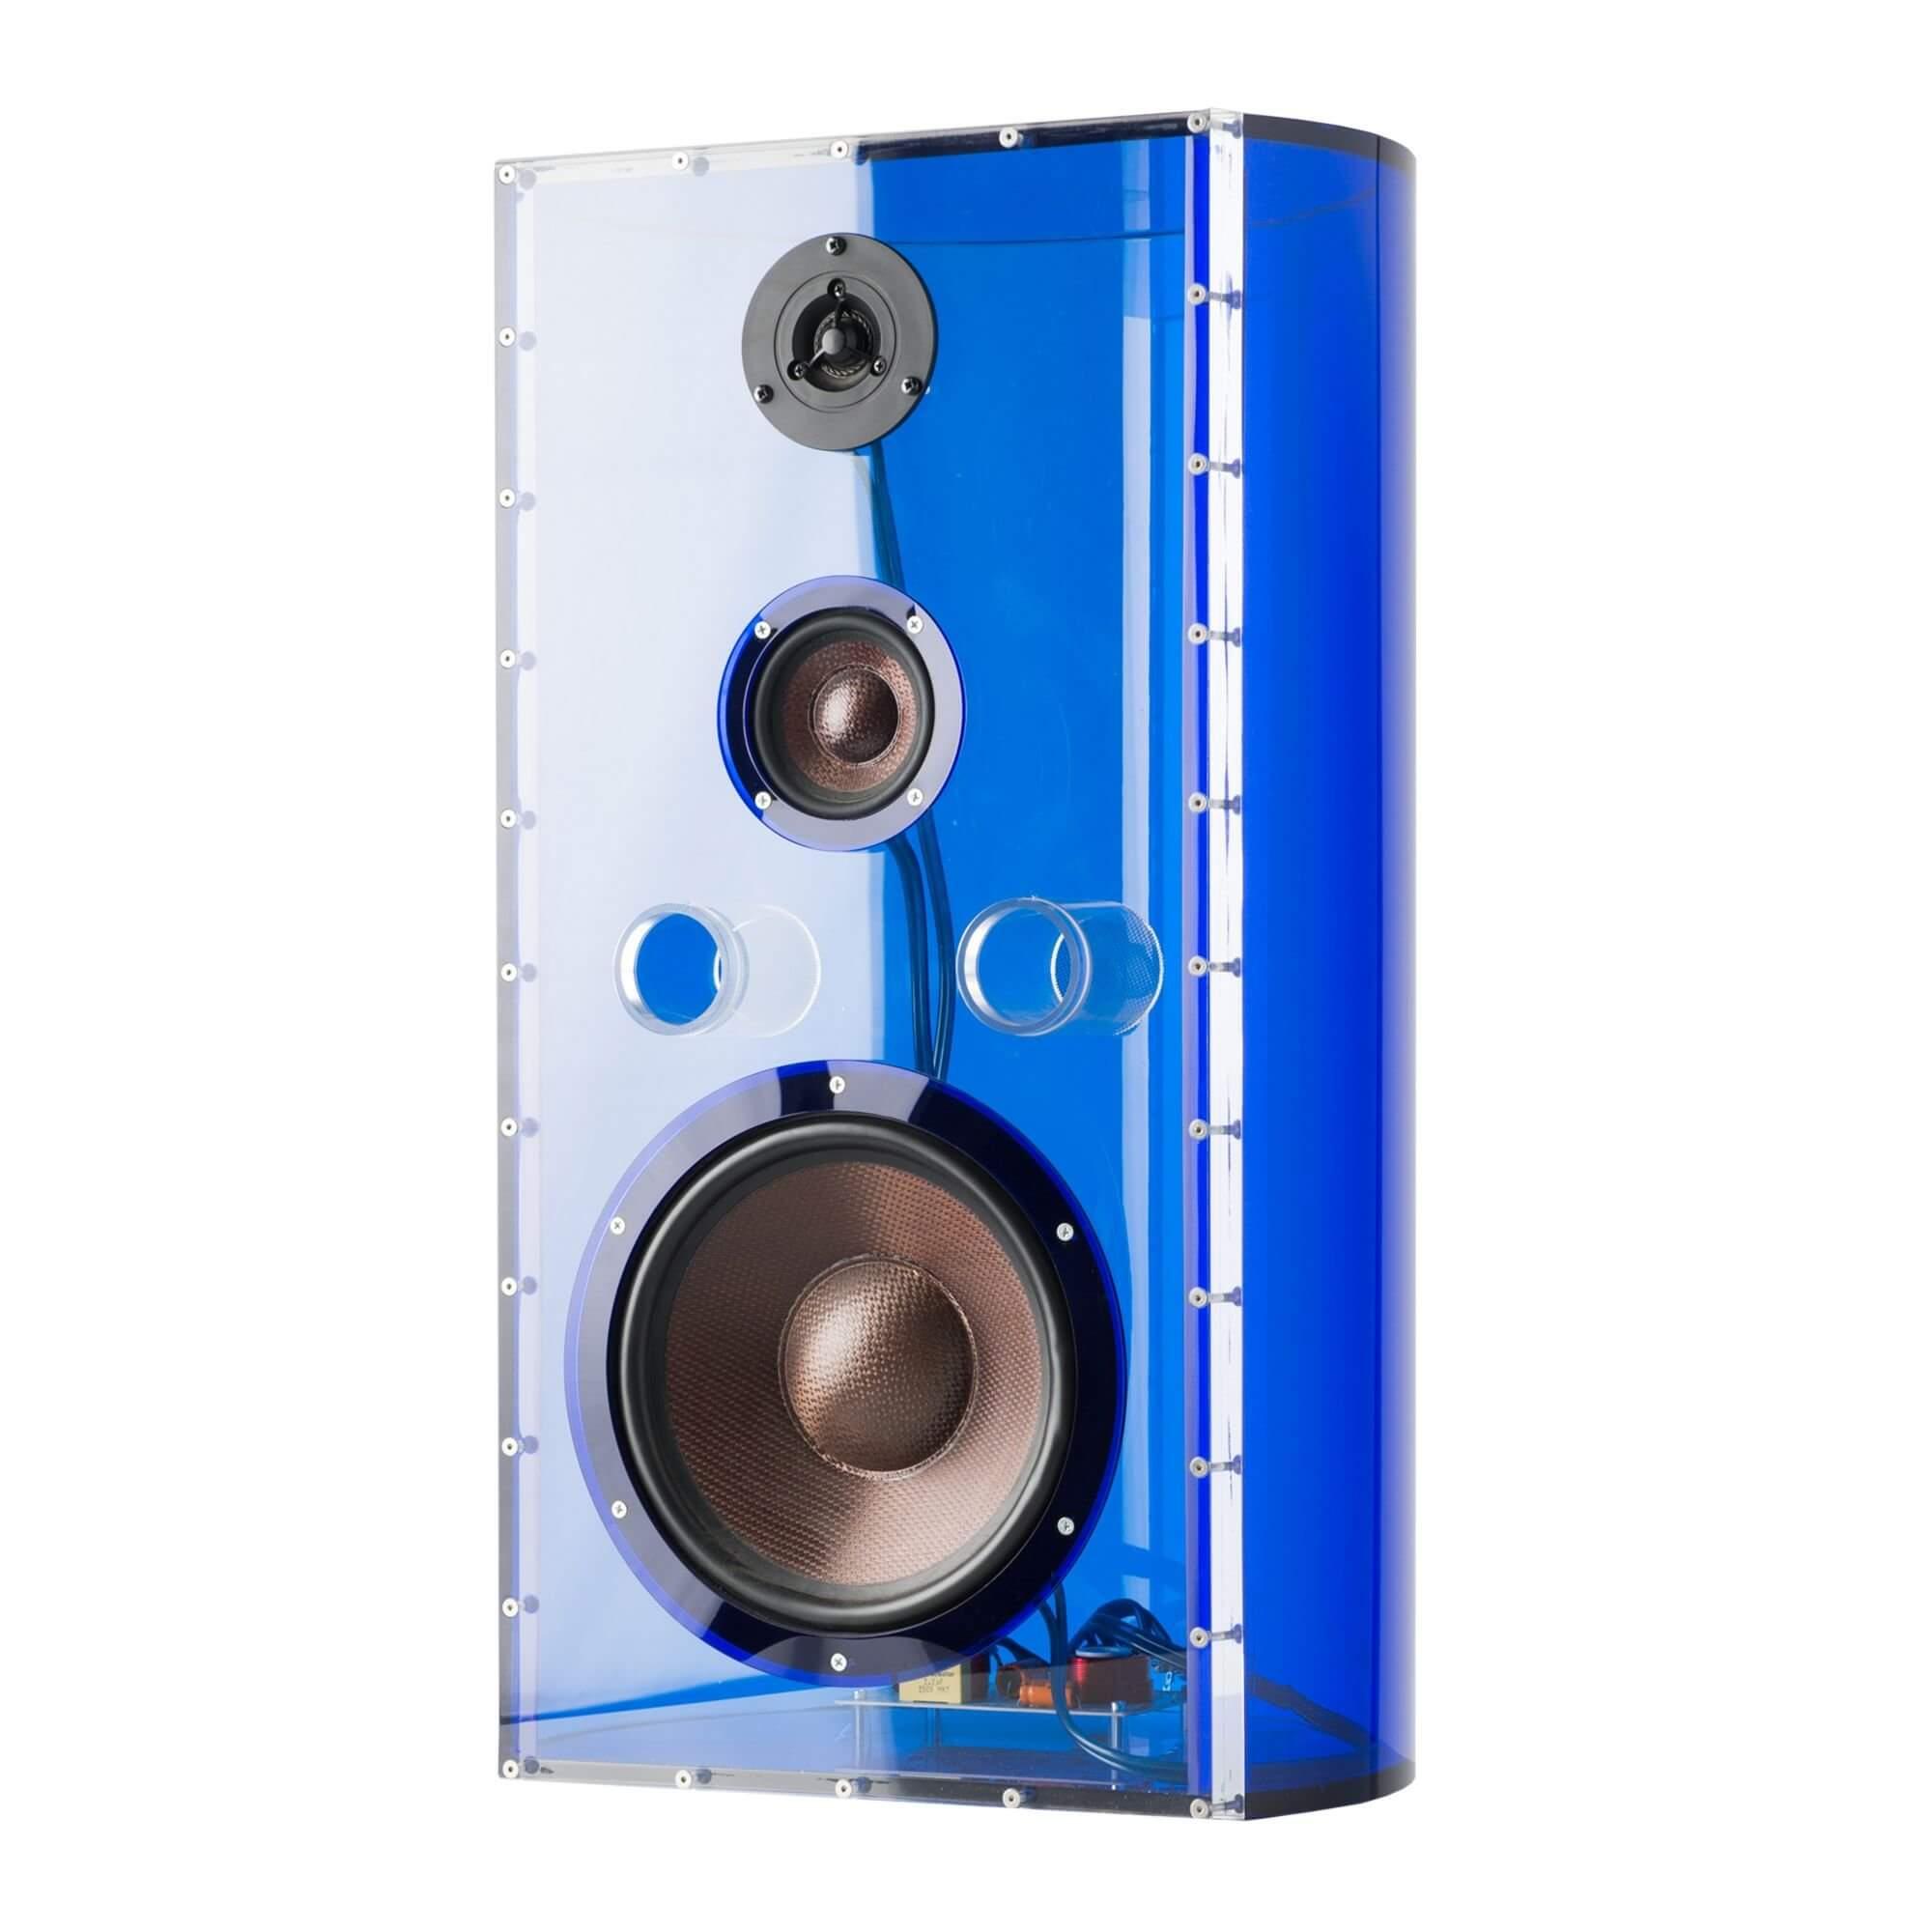 Acryline Lautsprecher-Boxe aus Acrylglas musikboxe boxe boxen lautsprecher zubehör musik acryl kunststoff spezialanfertigung